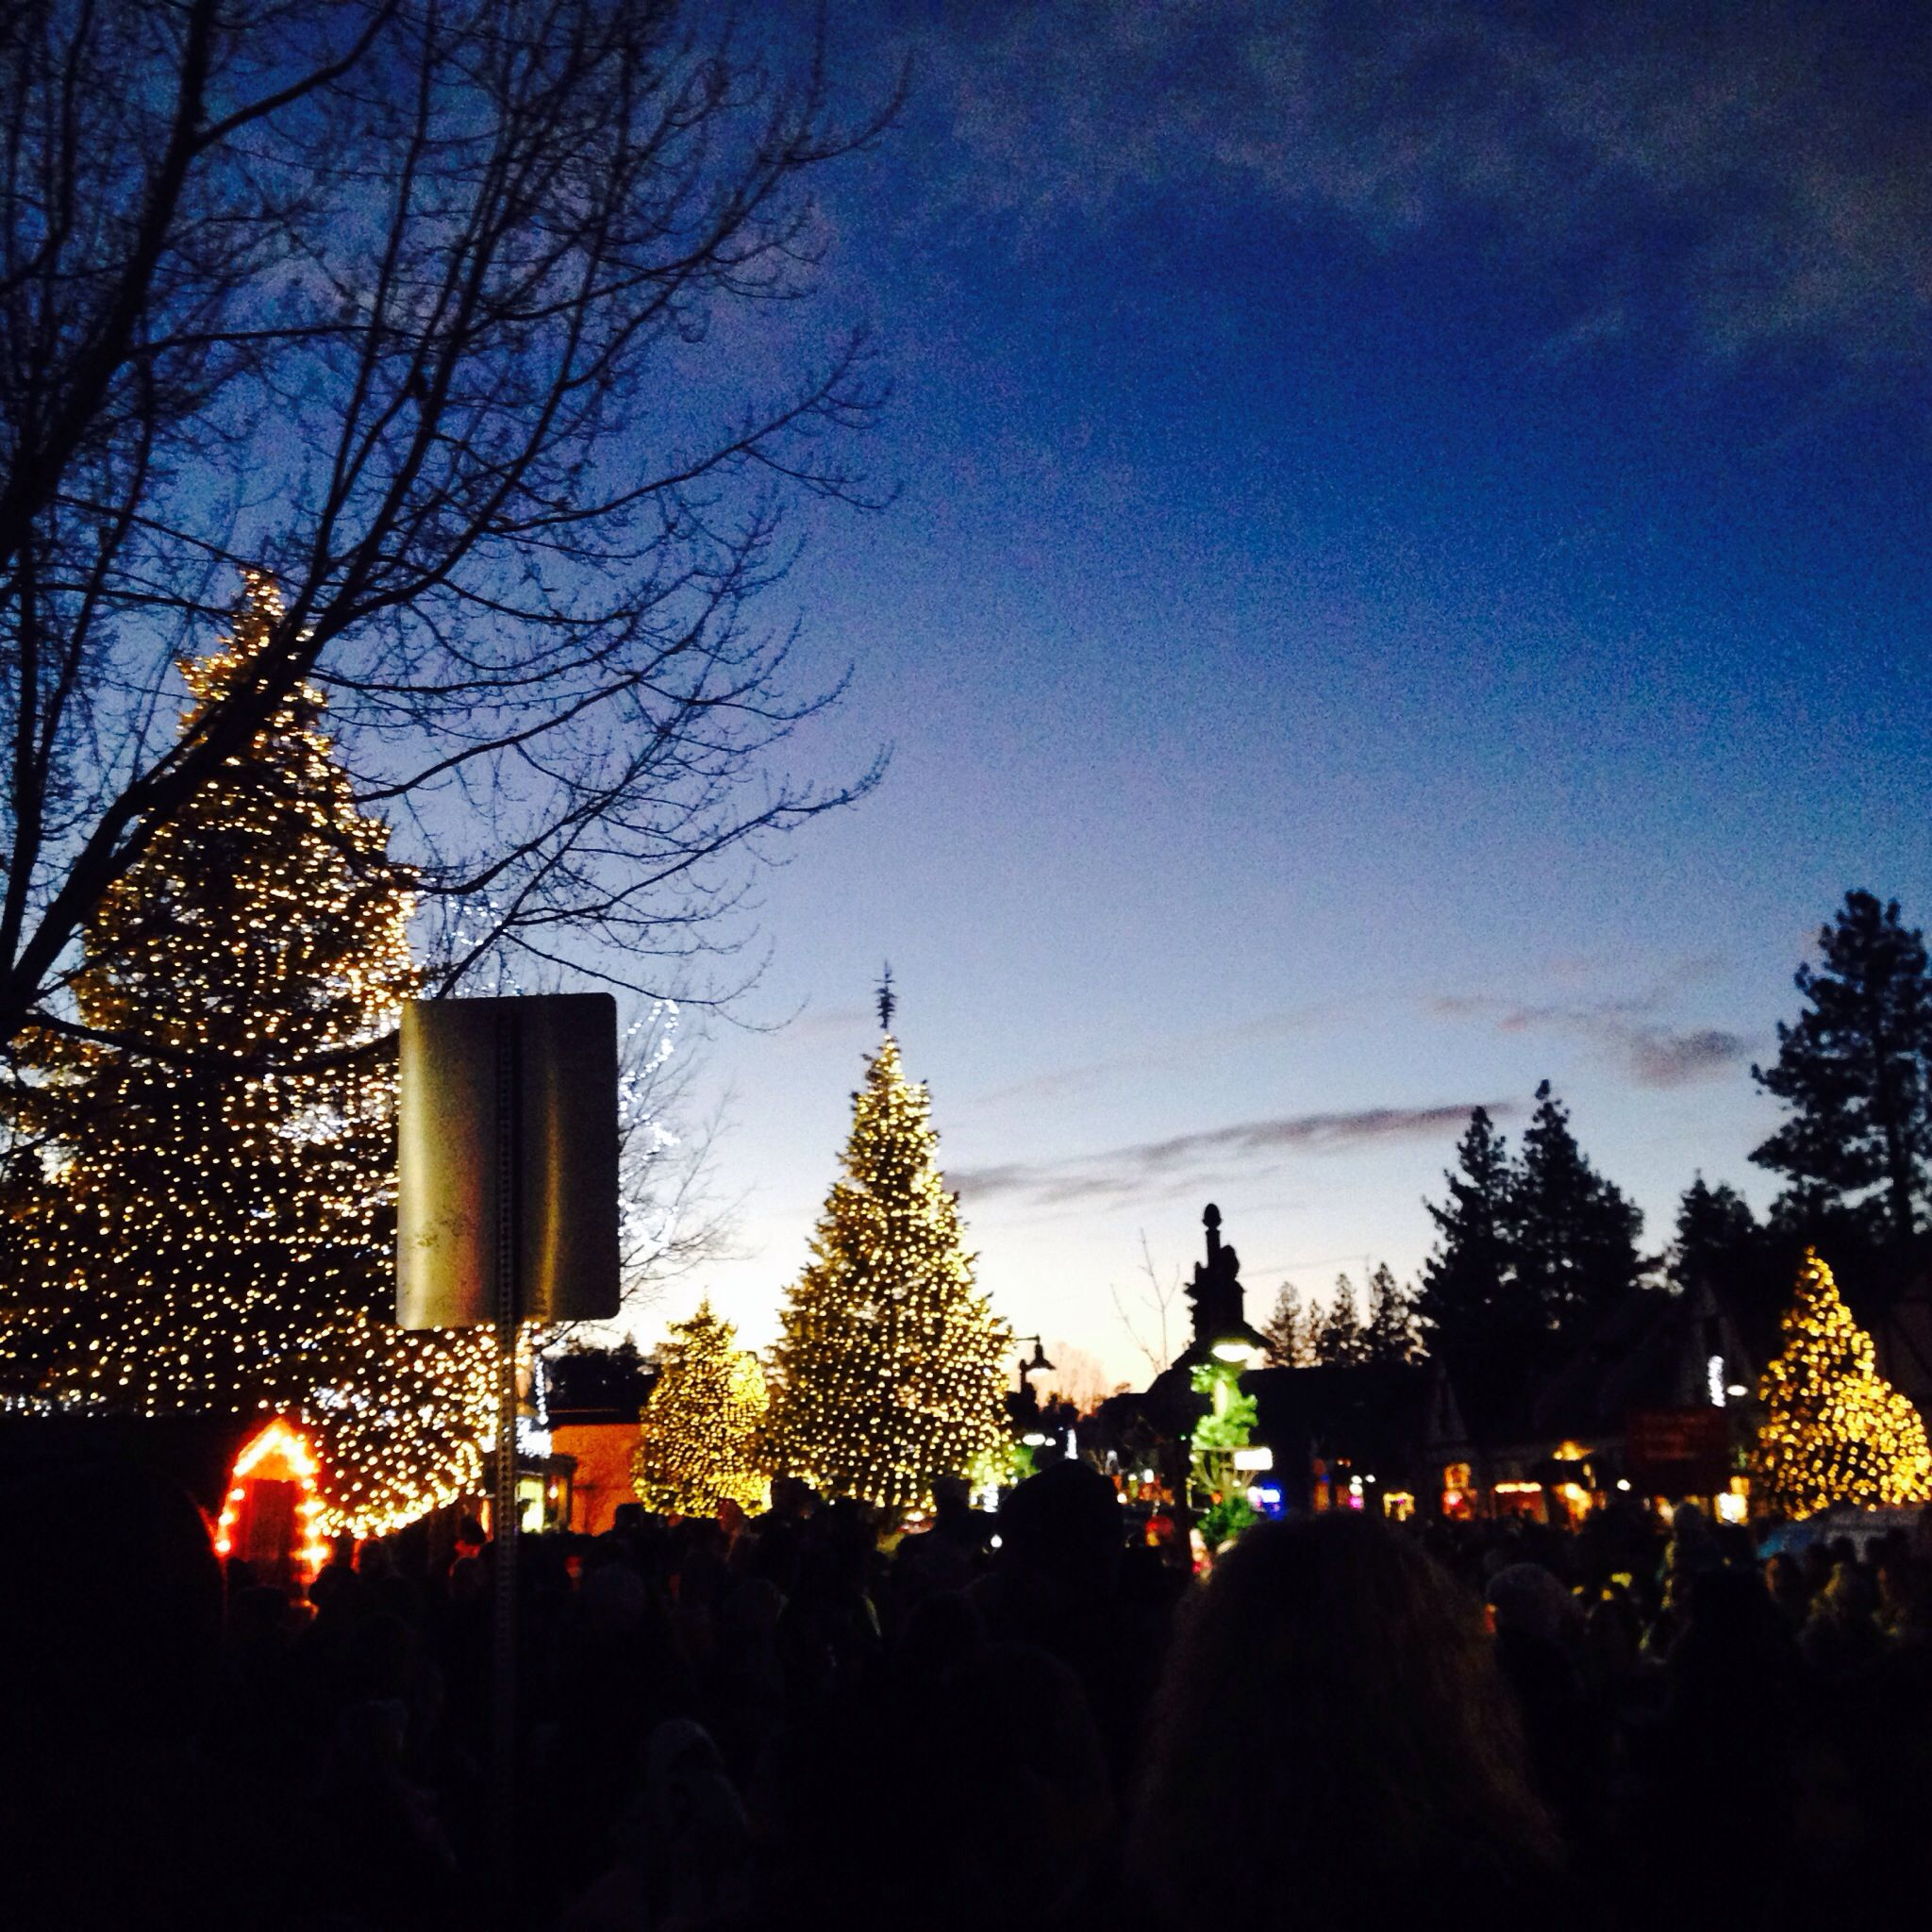 toluca lake christmas trees - HD2048×2048